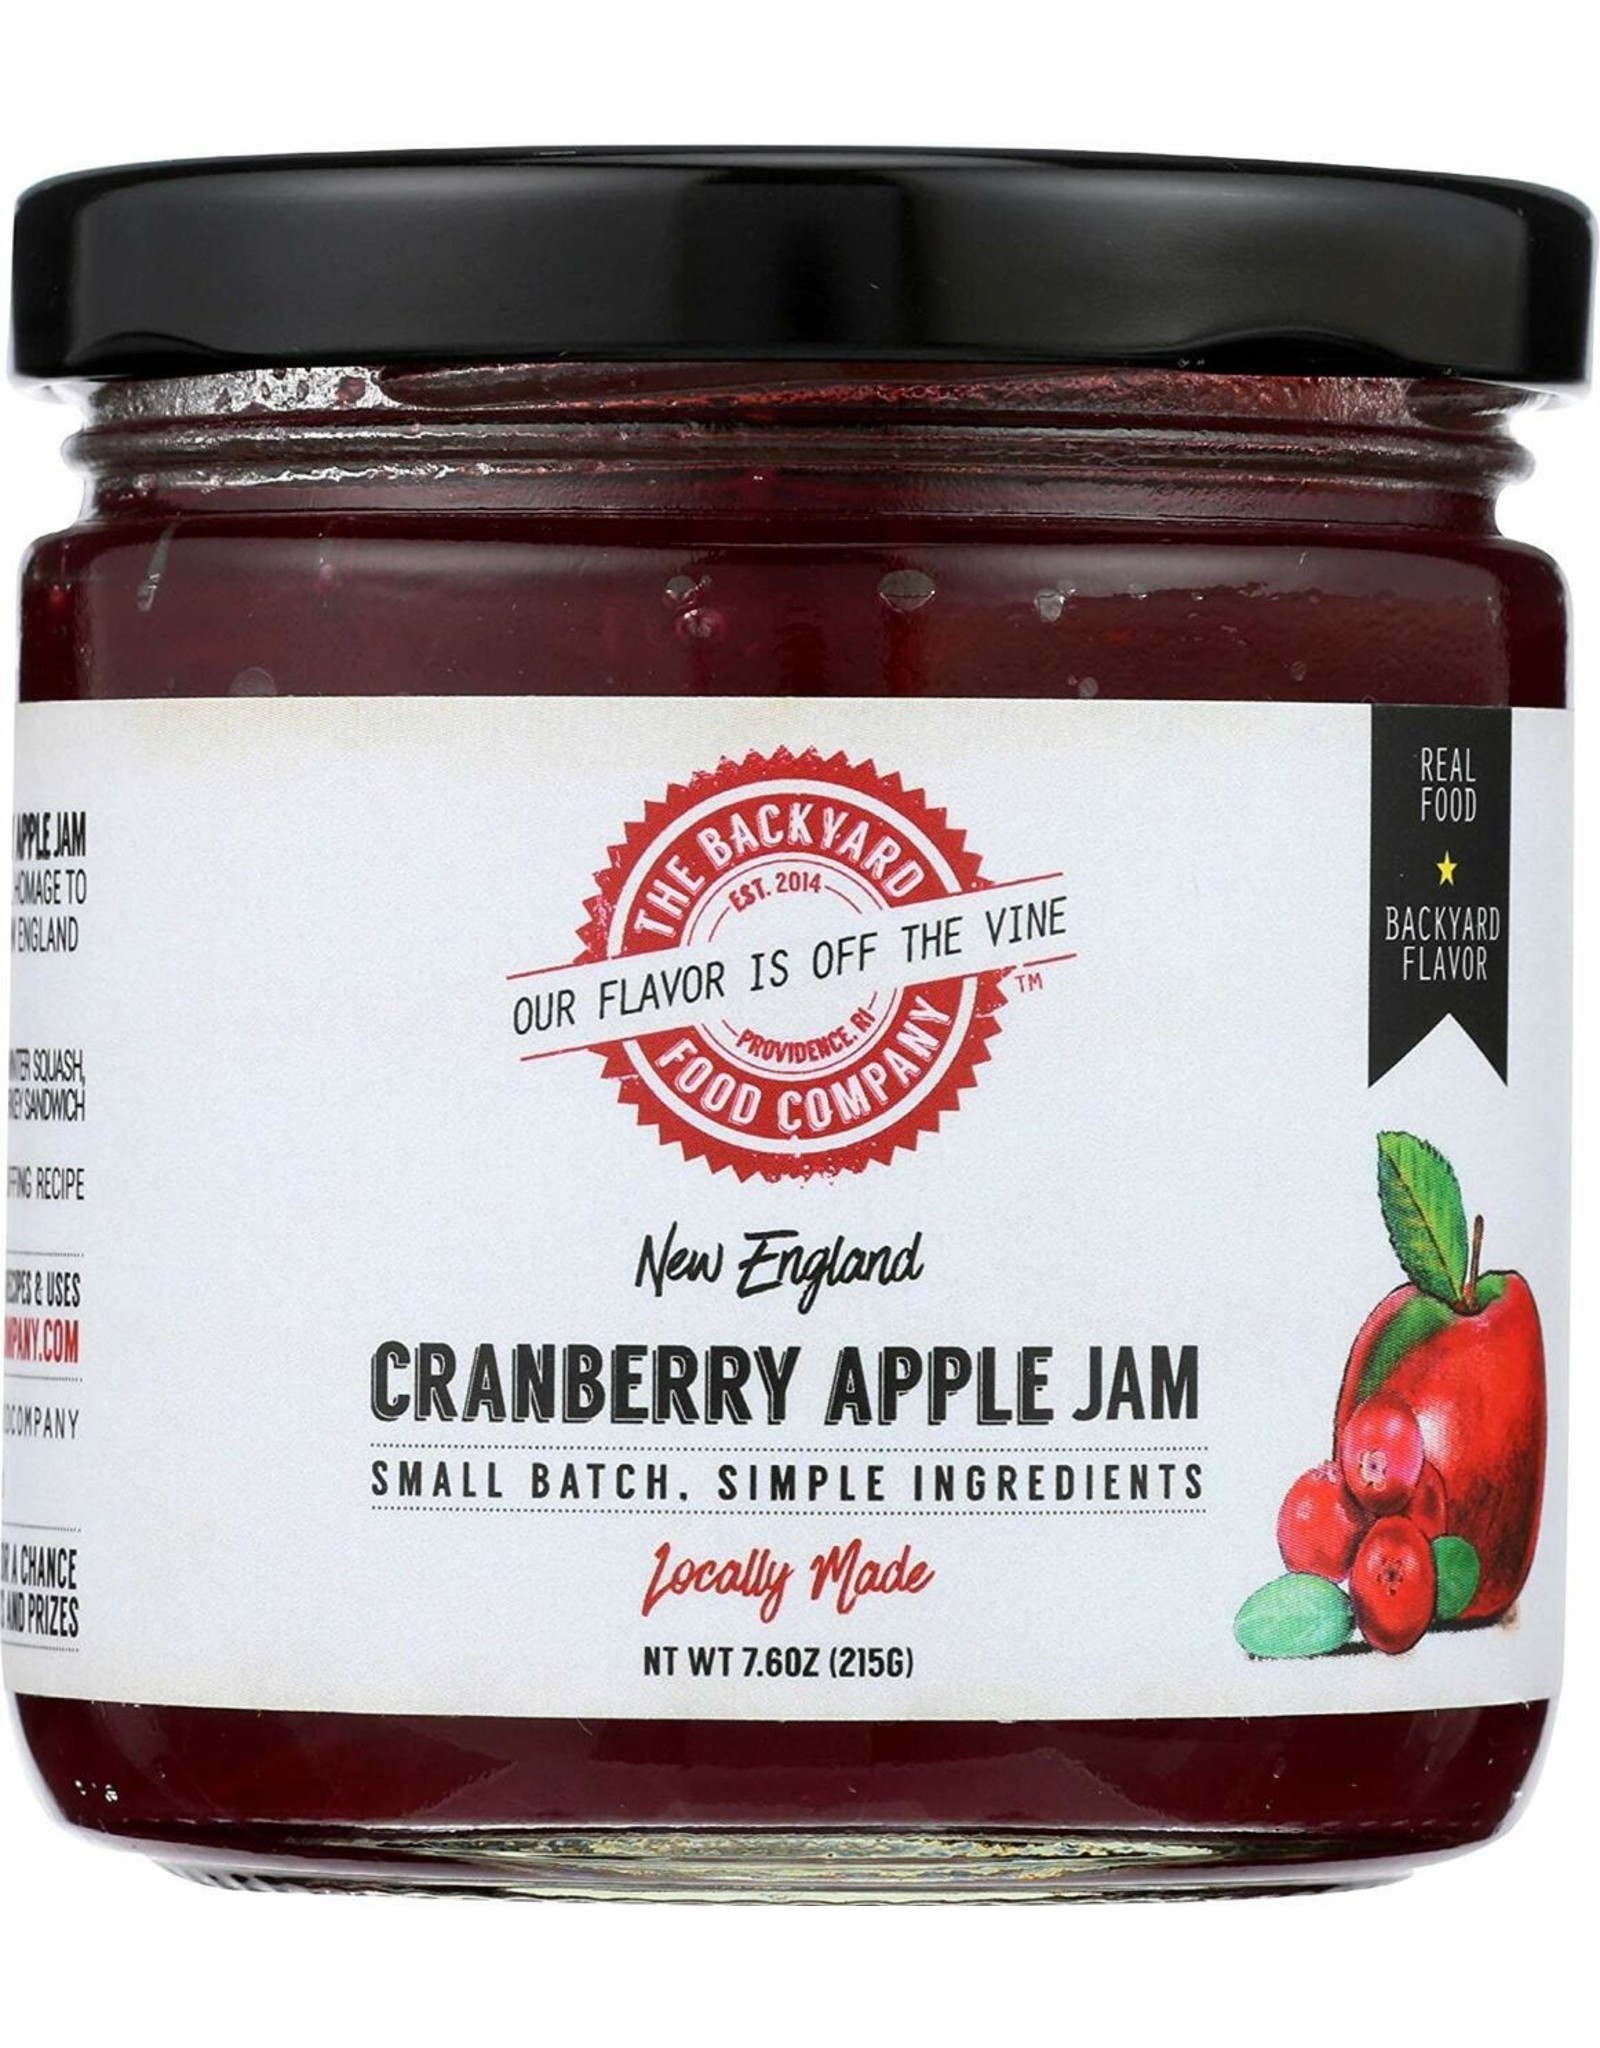 The Backyard Food Company RI Backyard Food Co. Cranberry Apple Jam